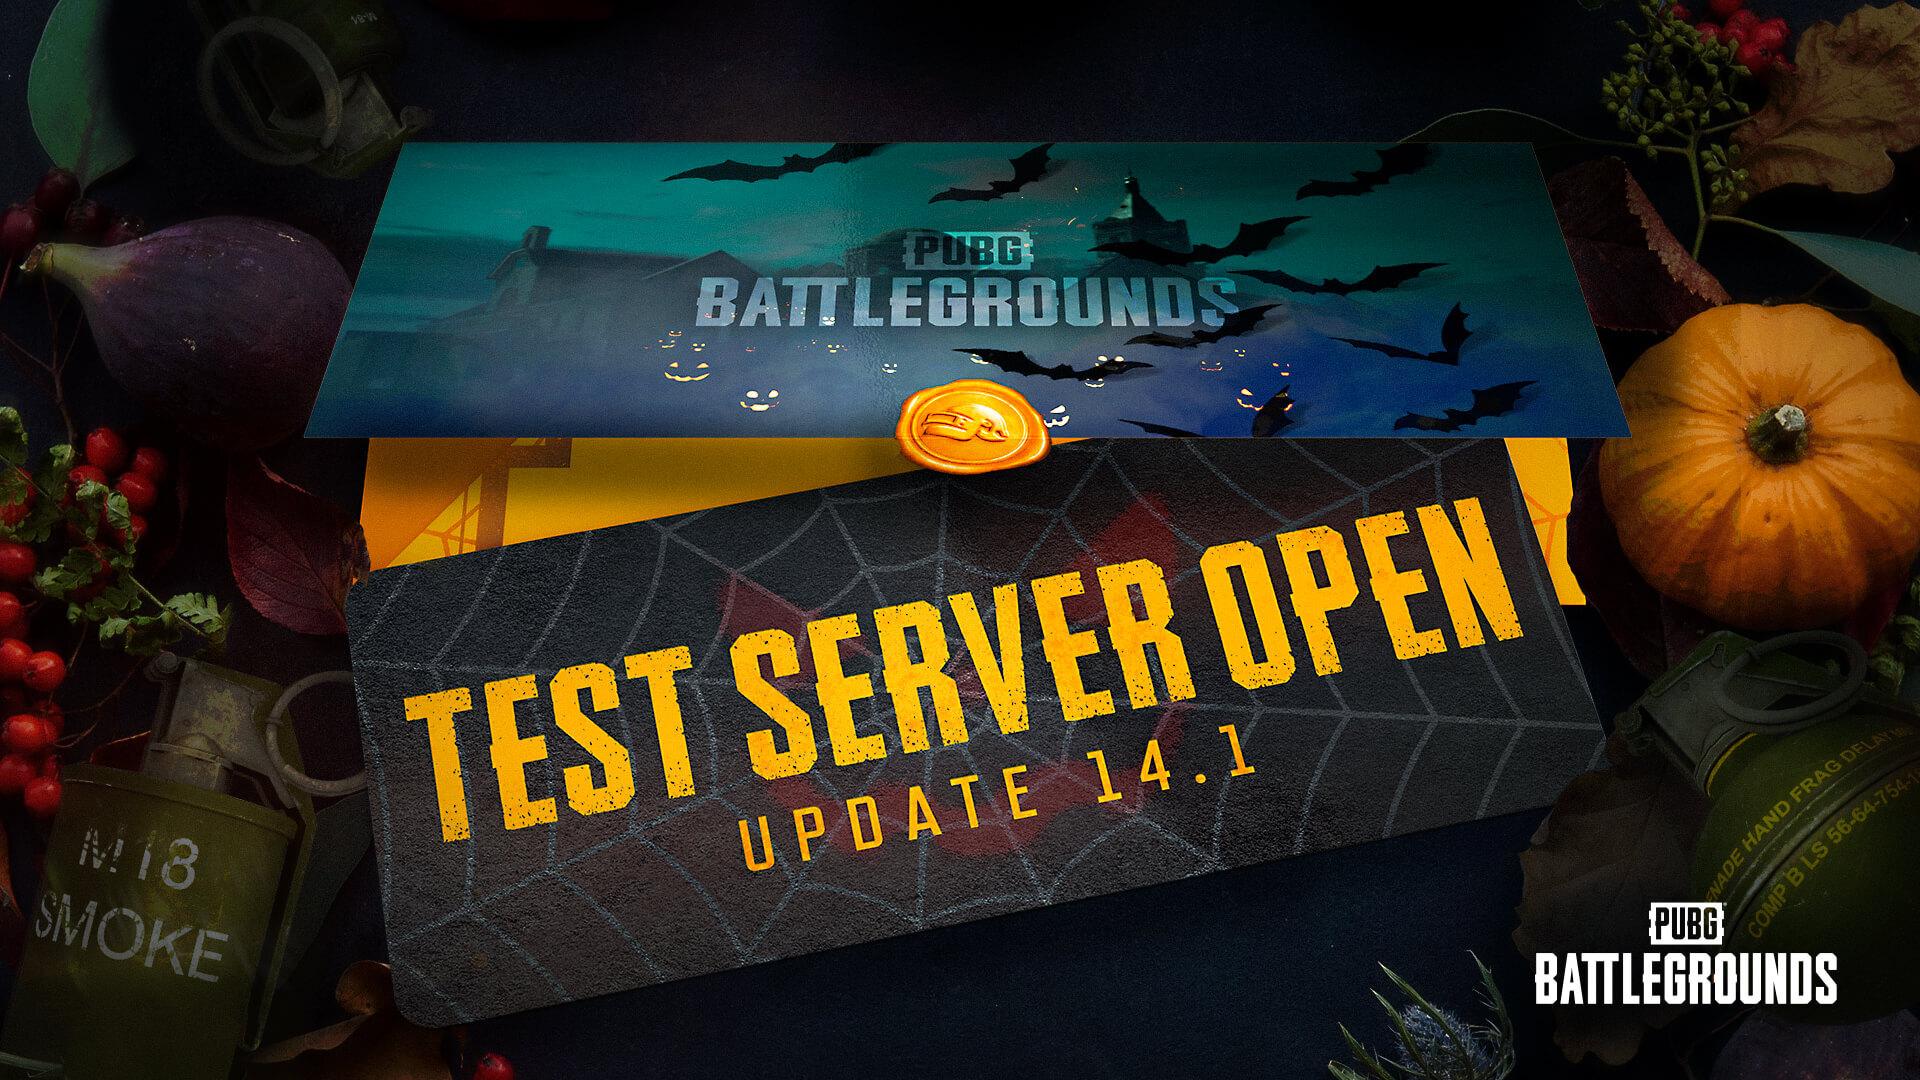 pubg-update-14.1-goes-live-on-test-server